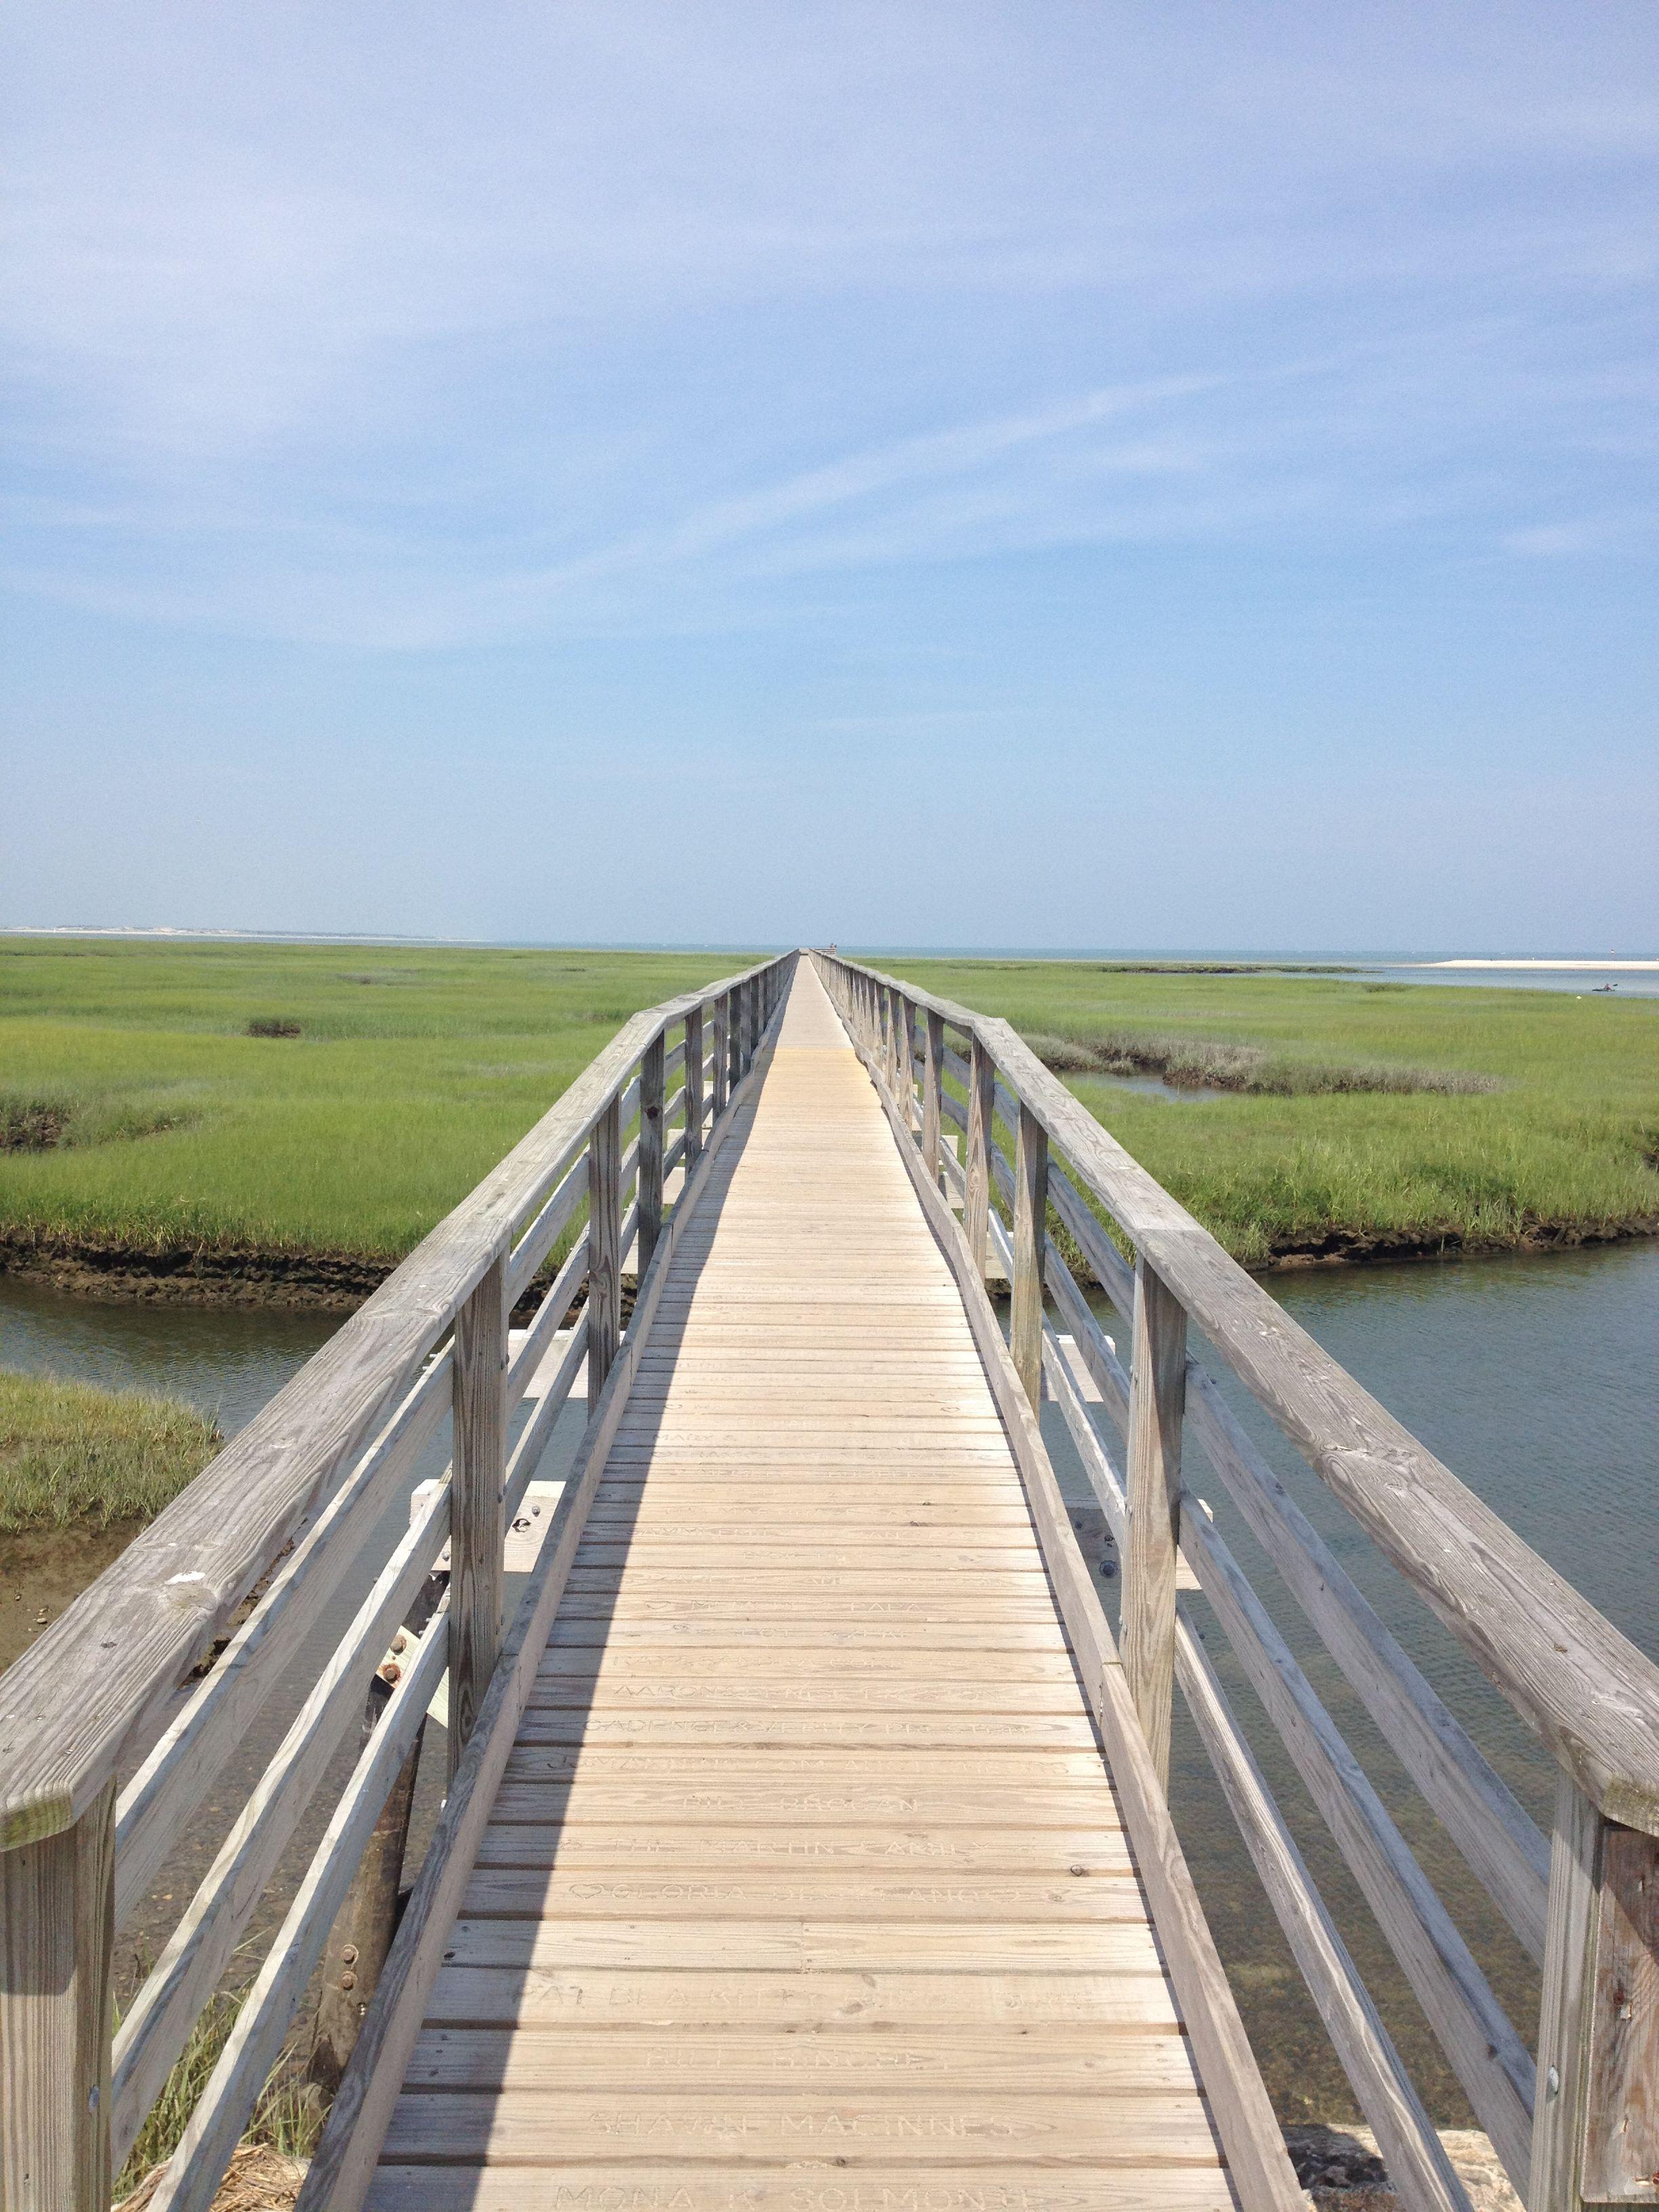 Gray S Beach Boardwalk Yarmouthport Vacaciones En Cape Cod Nantucket Playas Hermosas Machusetts